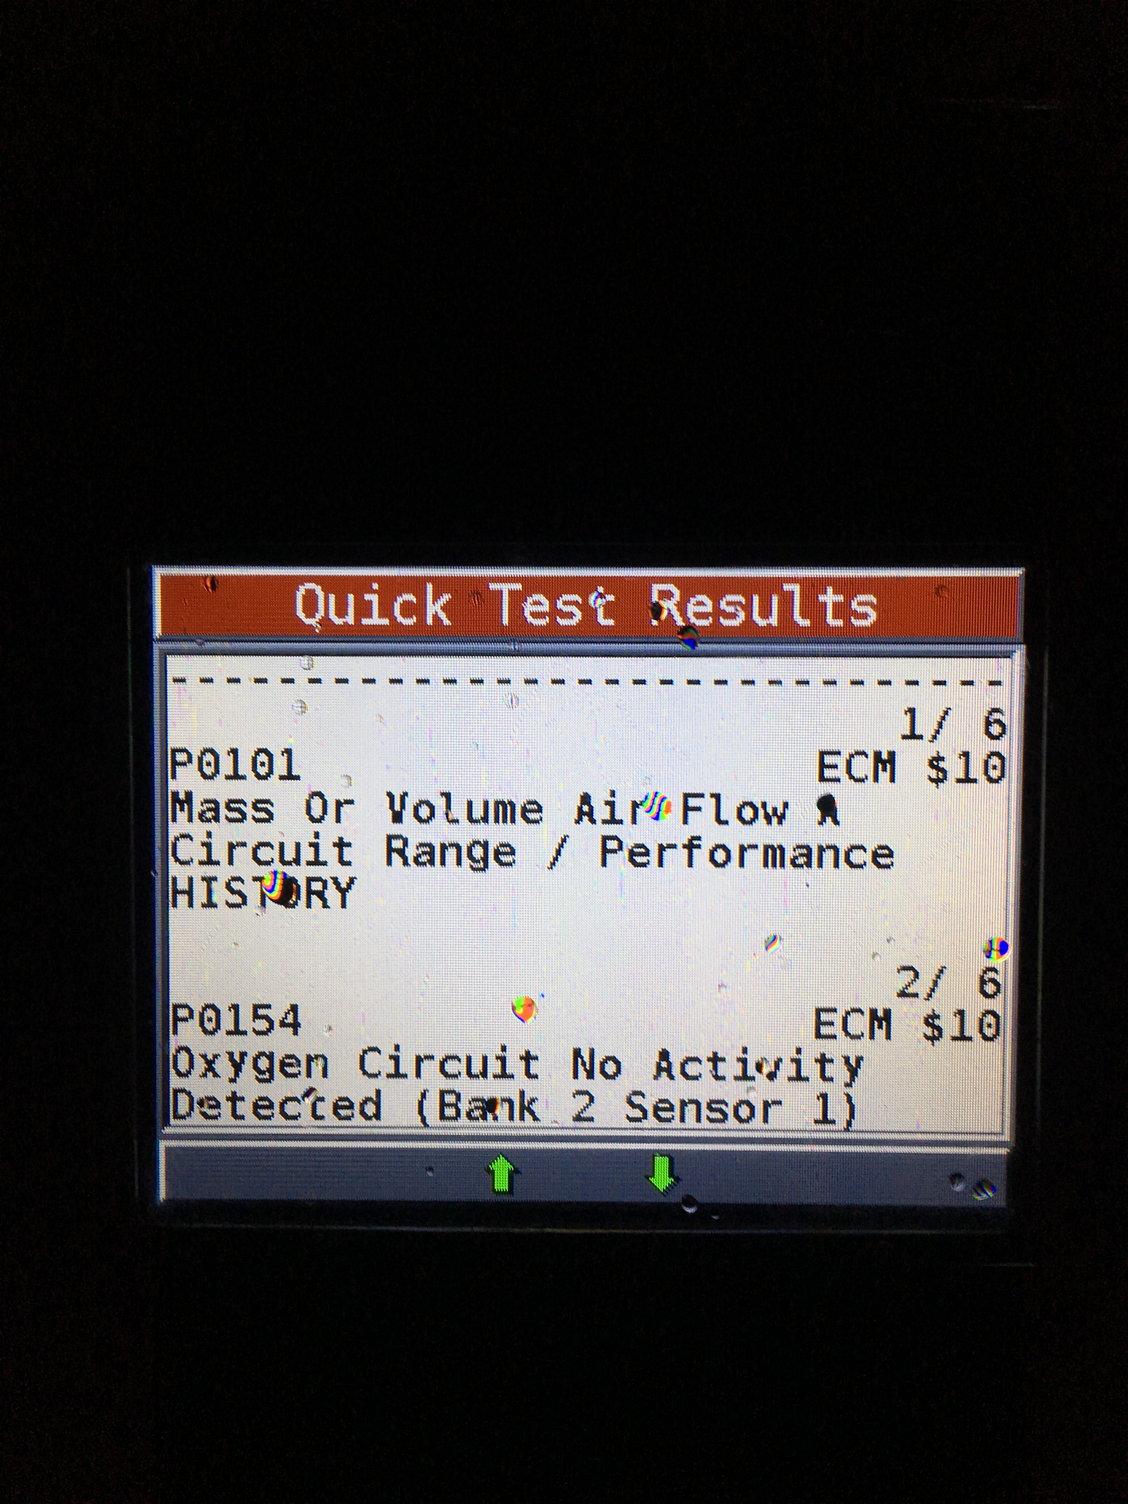 2002 blazer xtreme, o2 sensors - Page 2 - Blazer Forum - Chevy